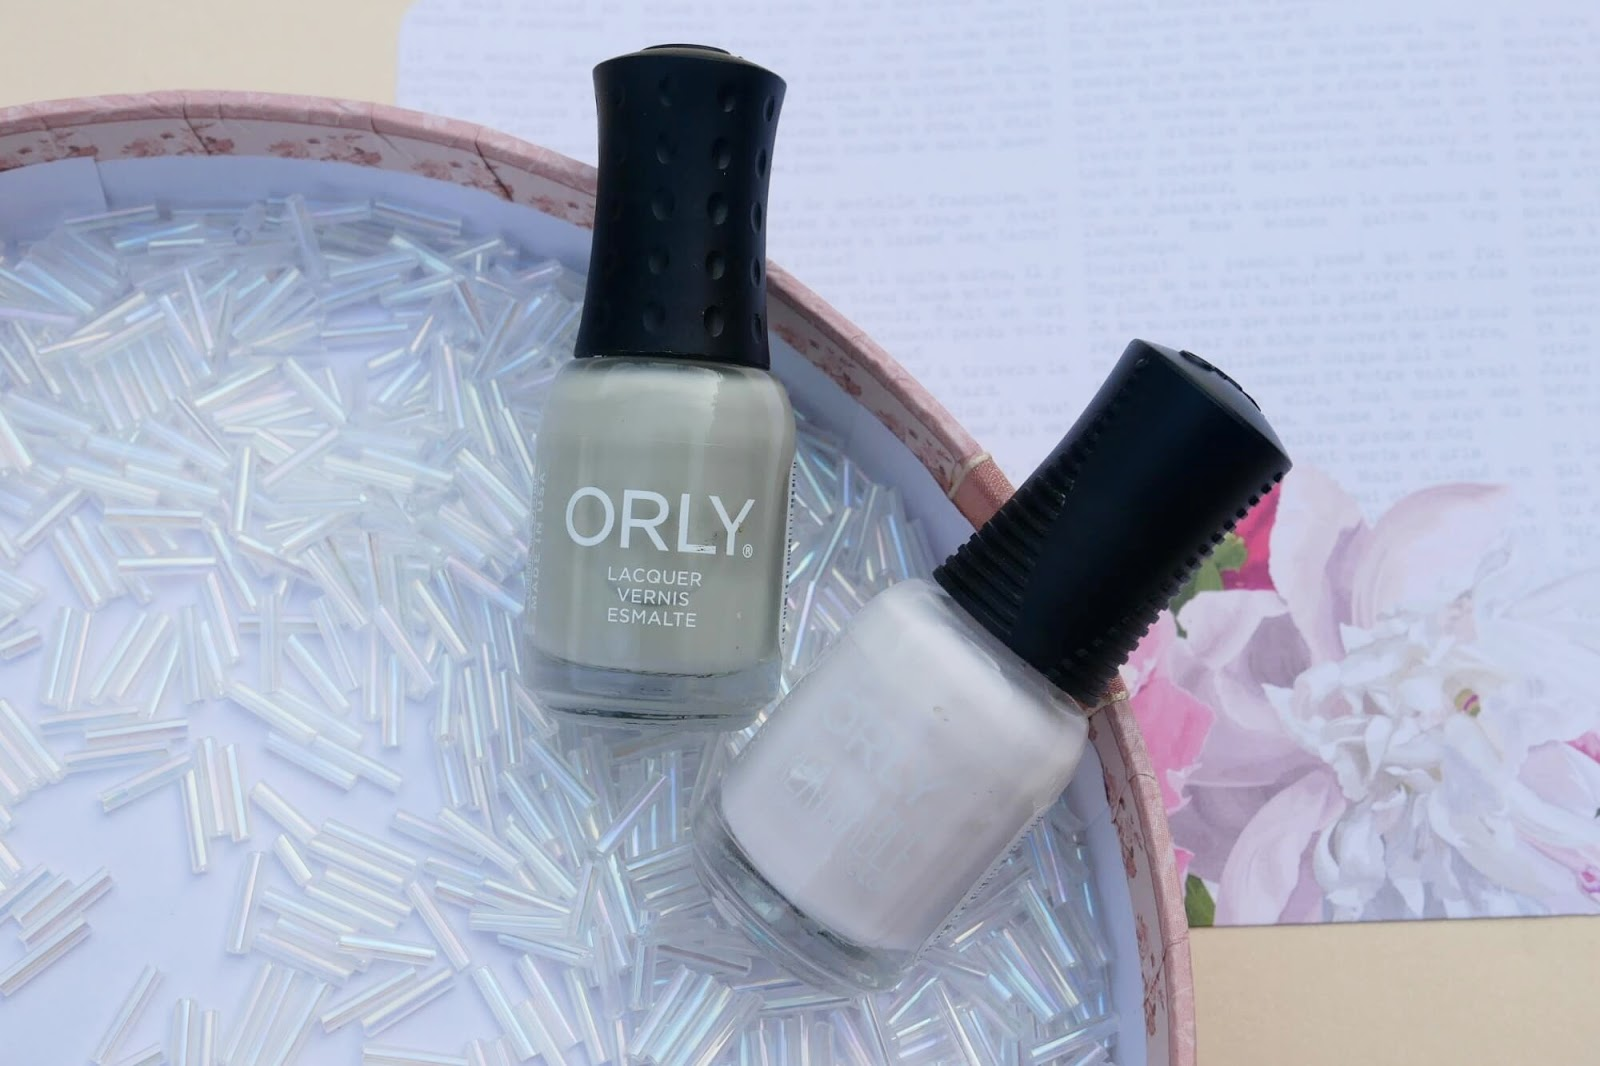 lakiery do paznokci ORLY mini